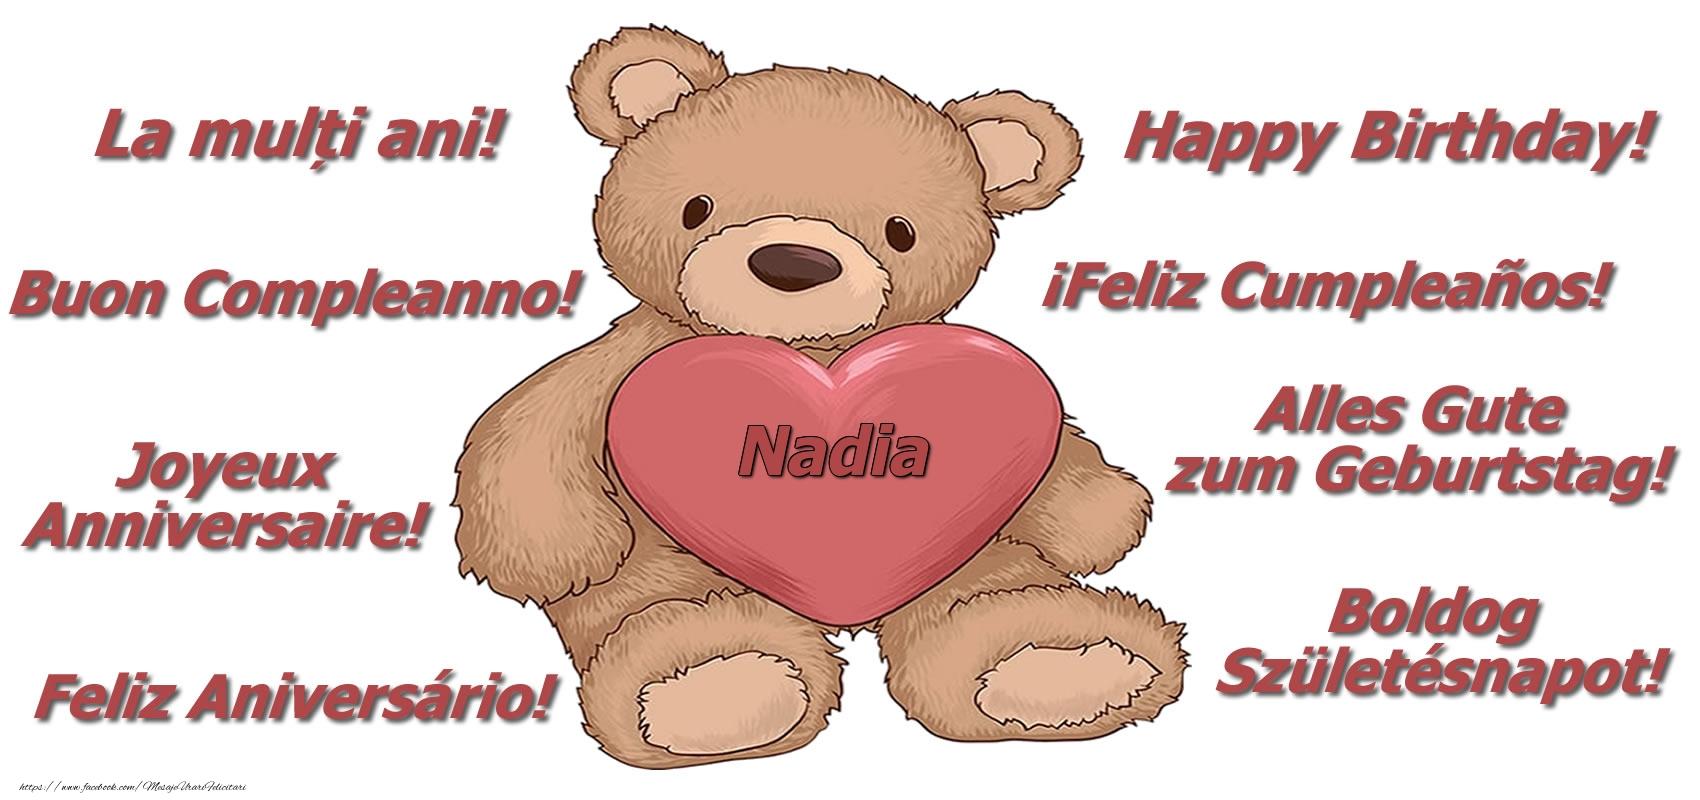 Felicitari de zi de nastere - La multi ani Nadia! - Ursulet